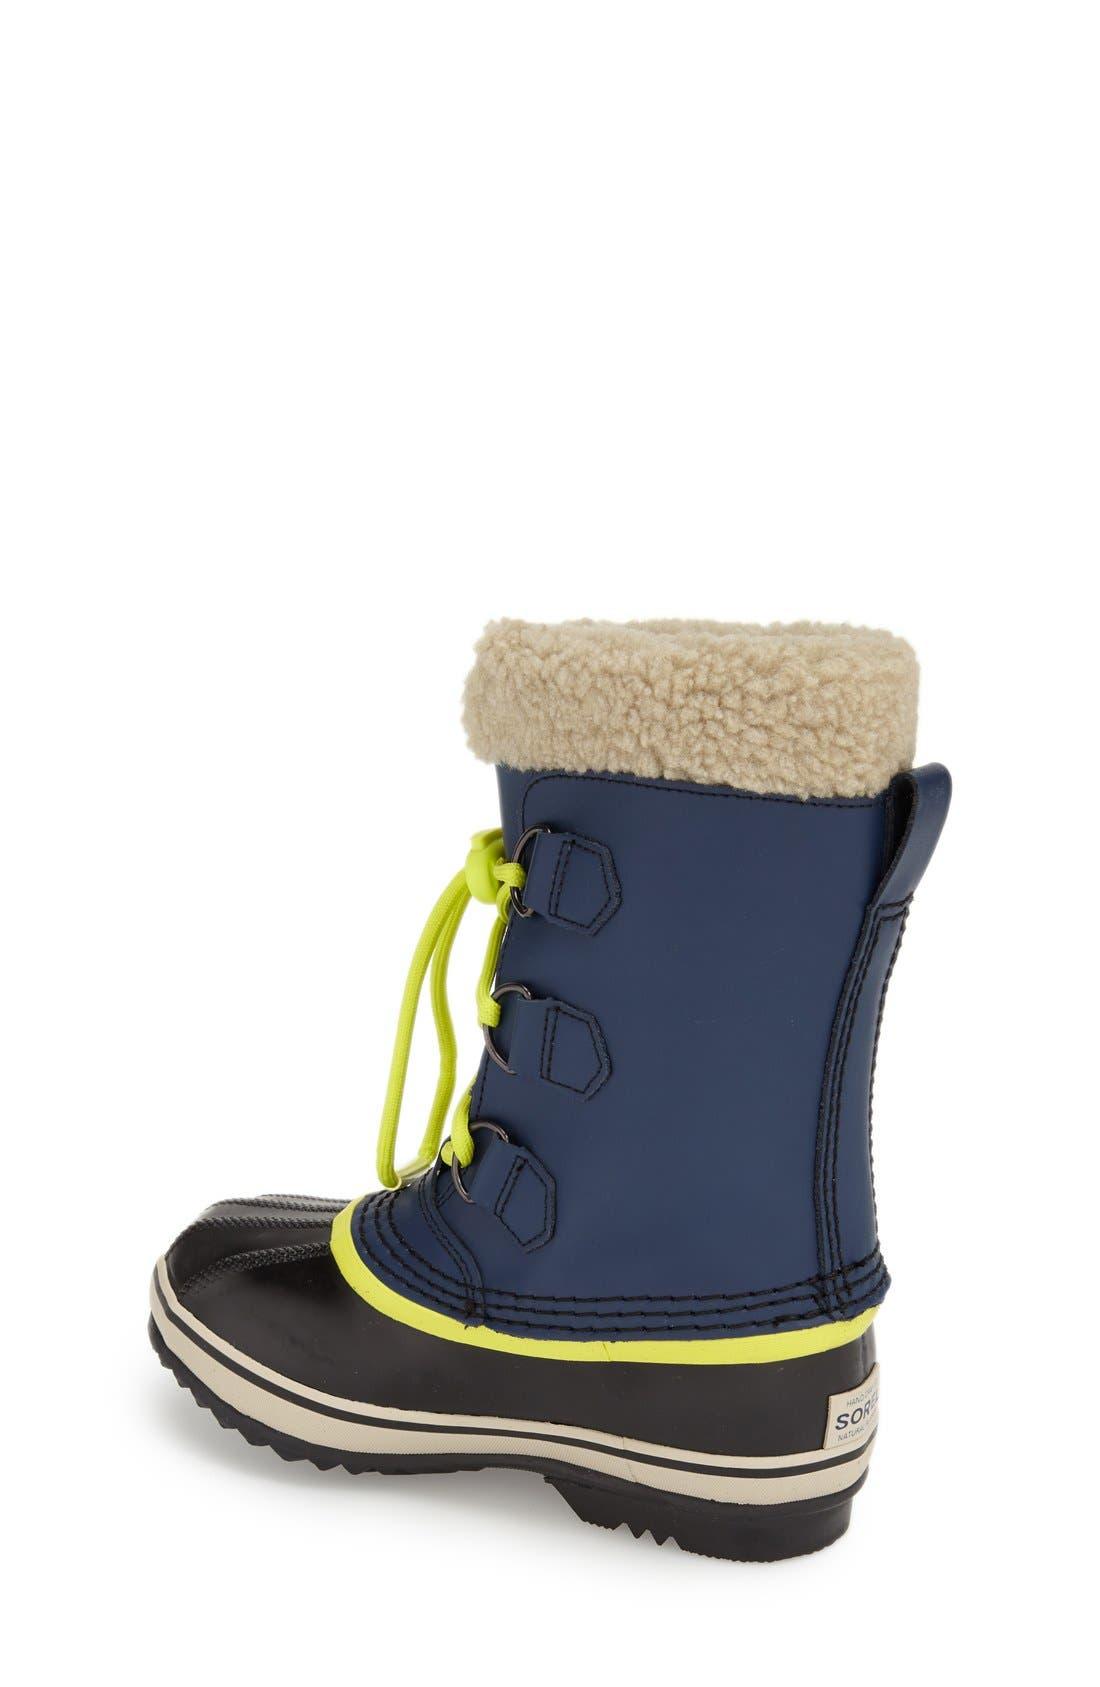 Alternate Image 2  - SOREL 'Yoot Pac' Waterproof Snow Boot (Toddler, Little Kid & Big Kid)